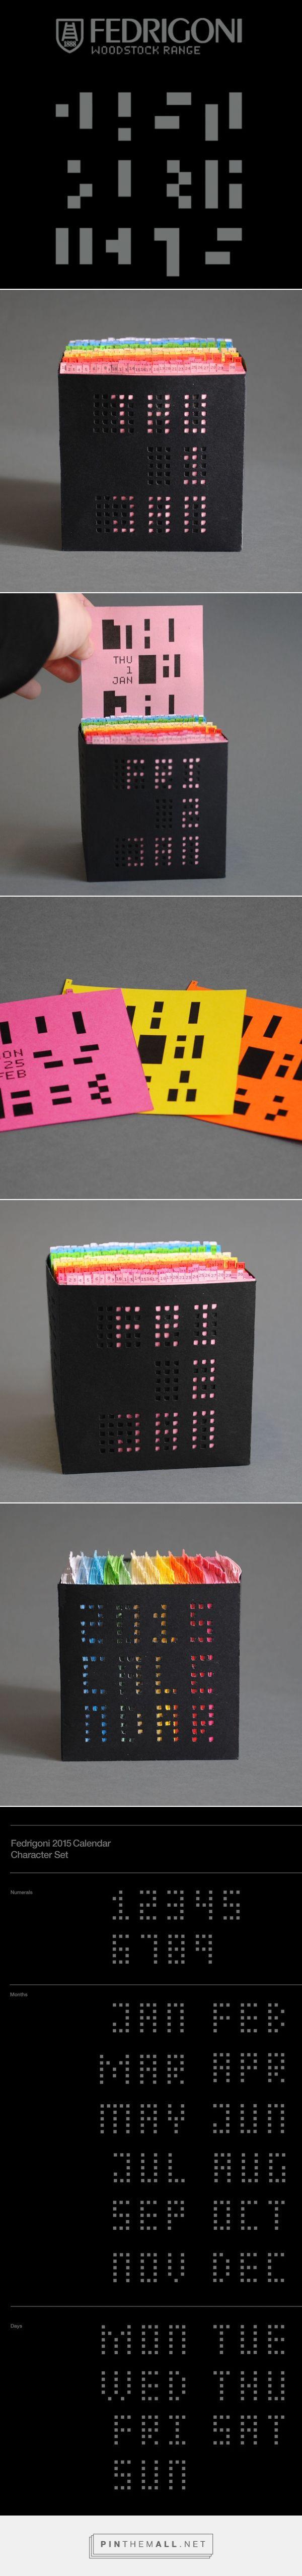 Interesting calendar packaging and design - Fedrigoni 2015 Calendar designed by Stuart Greer.